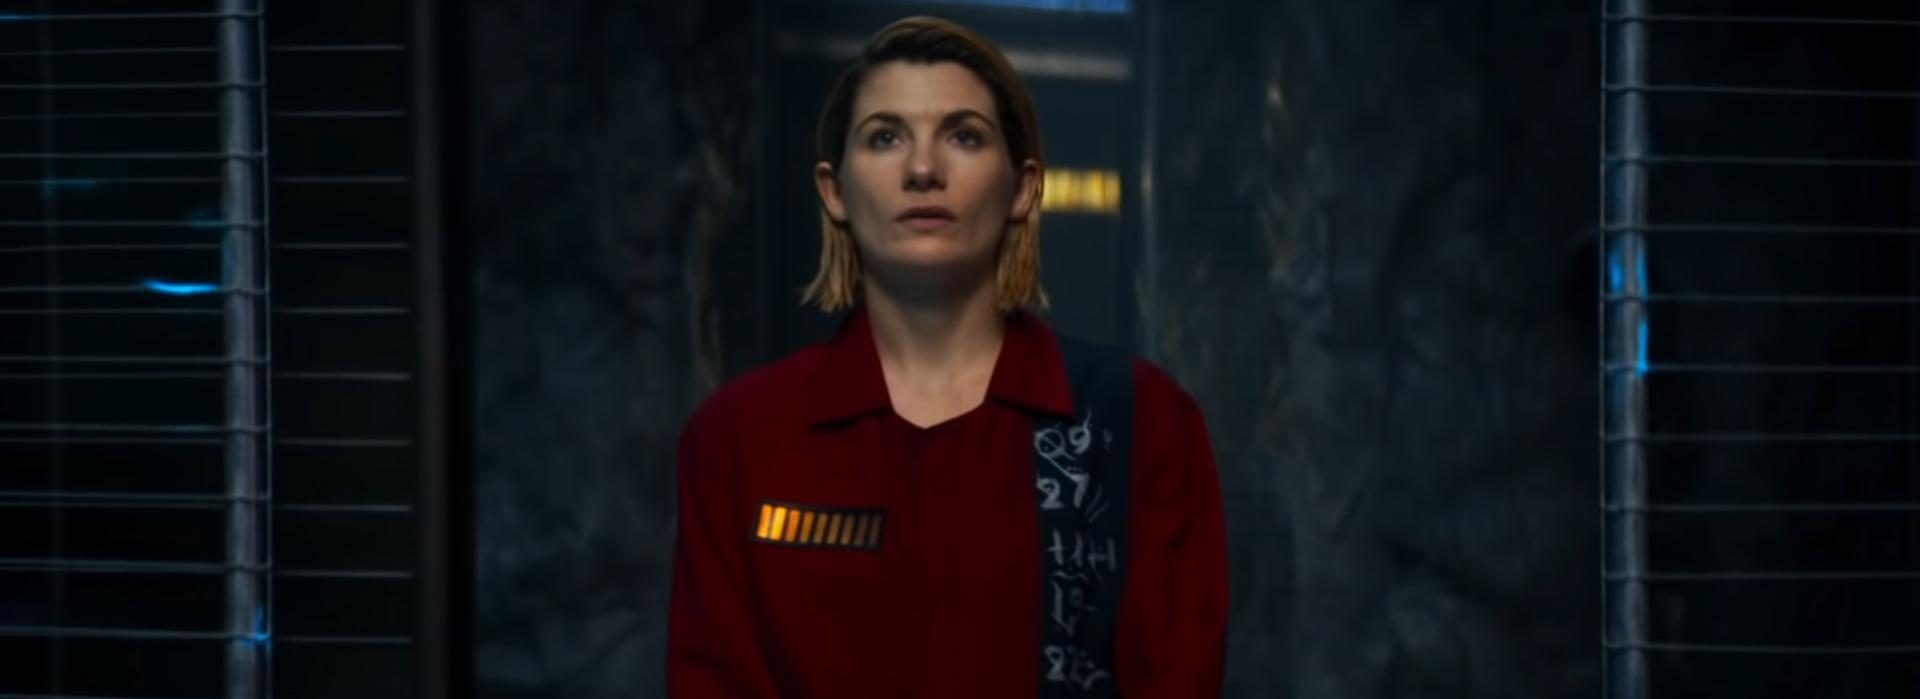 Doctor Who: Revolution Of The Daleks. Image Credit: BBC.